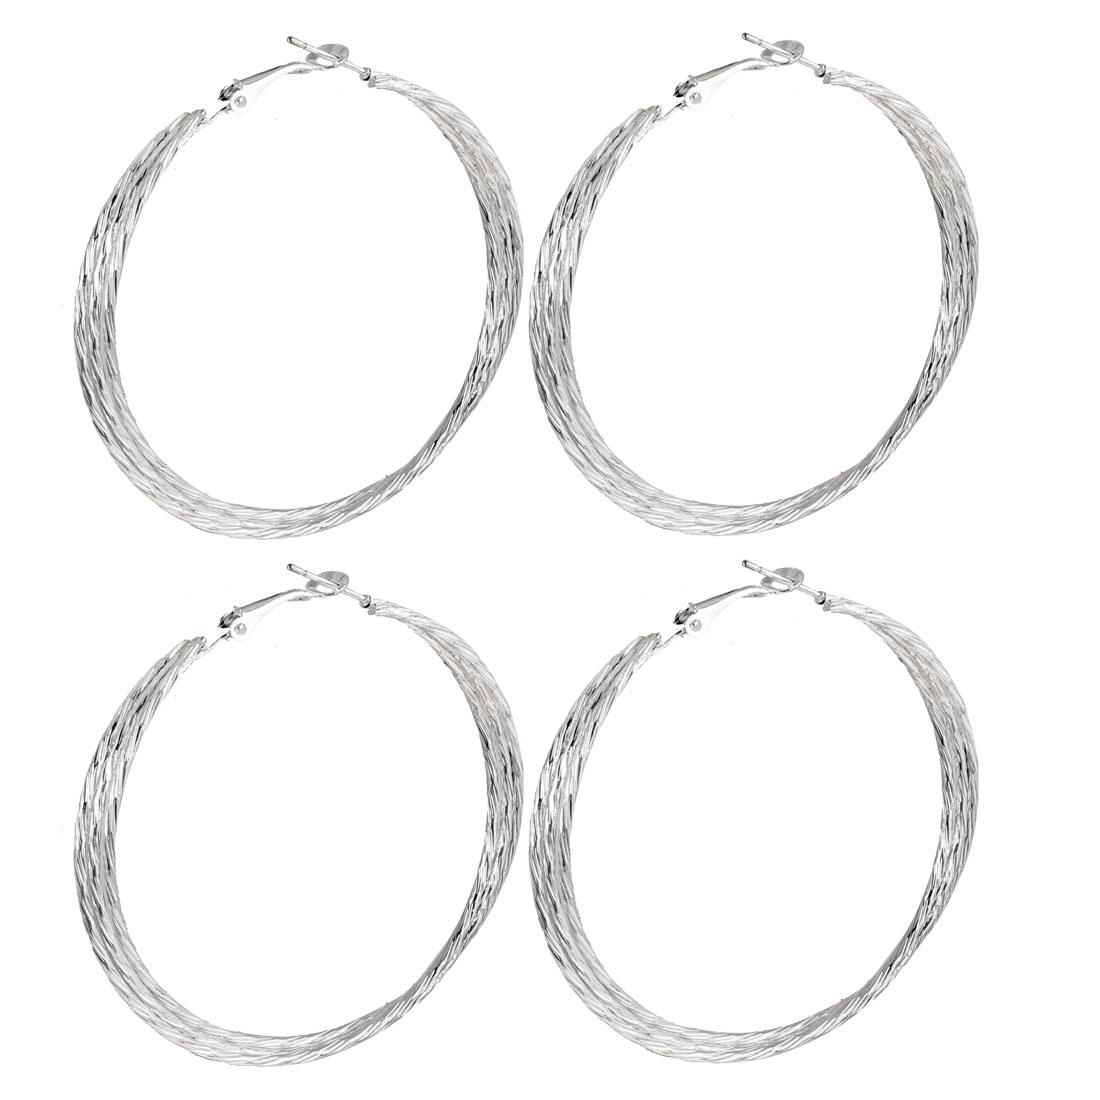 2 Pair Ear Ornament Spiral Hoop Earrings Earbob Silver Tone for Lady